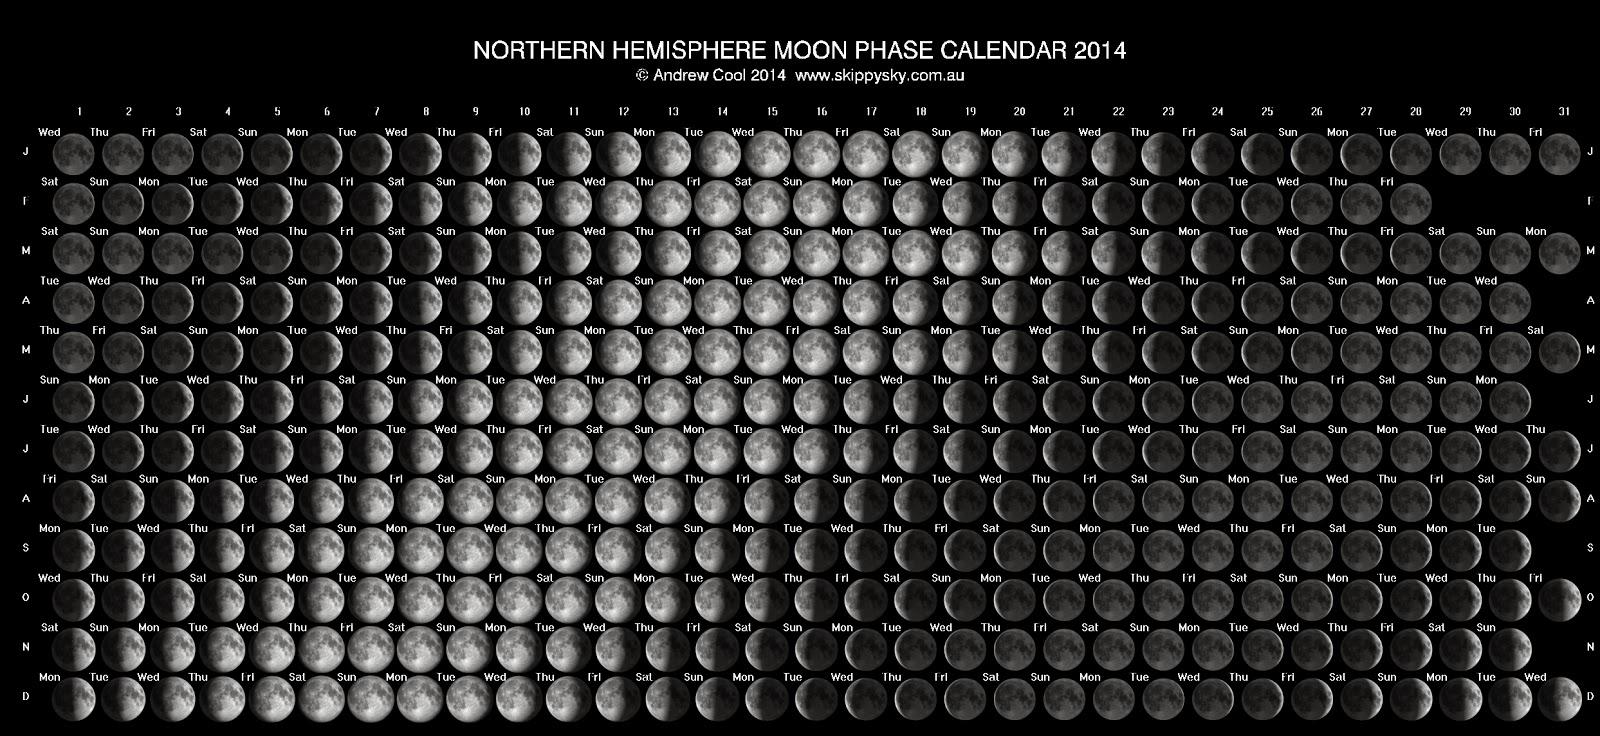 December Lunar Calendar 2014